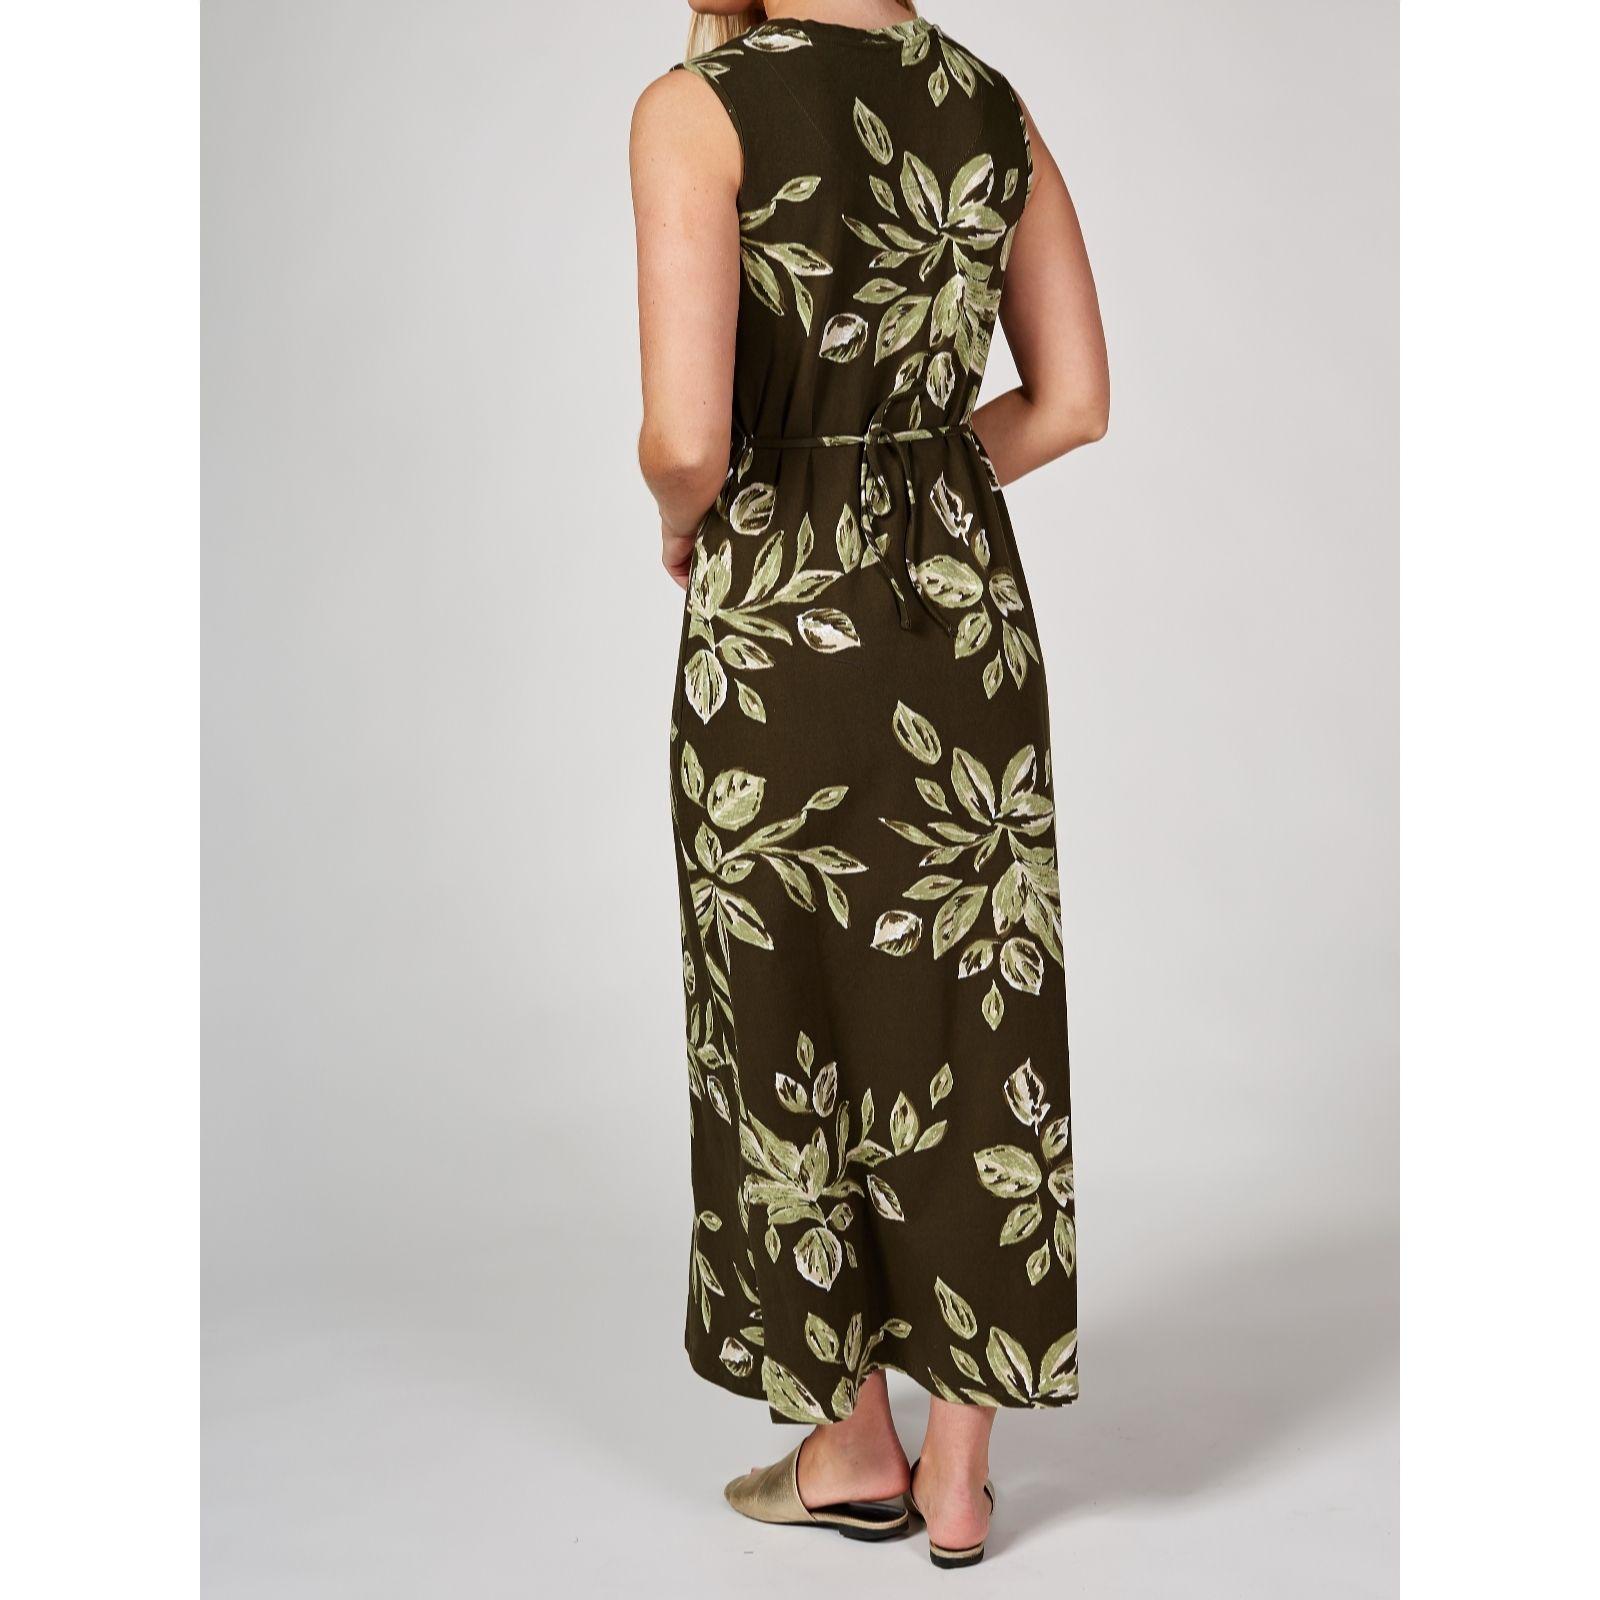 ca66970bc39be Denim & Co. Cotton Jersey Maxi Dress & Waterfall Cardigan Petite - QVC UK